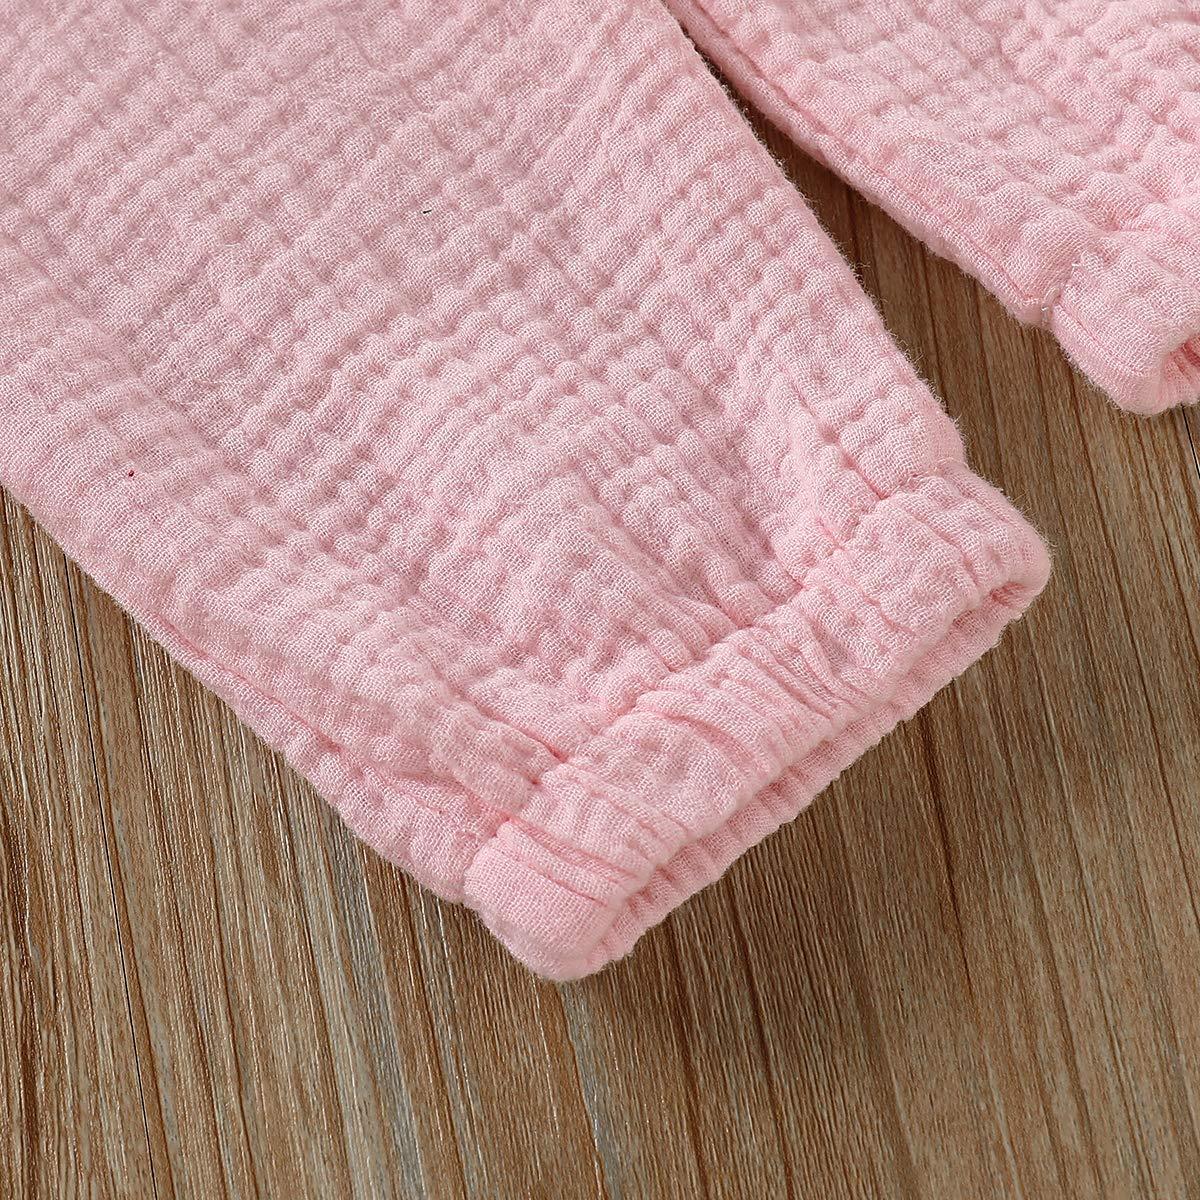 mimixiong Newborn Baby Girls One Piece Romper Clothes Sleeveless Jumpsuit Ruffled Strap Summer Bodysuit